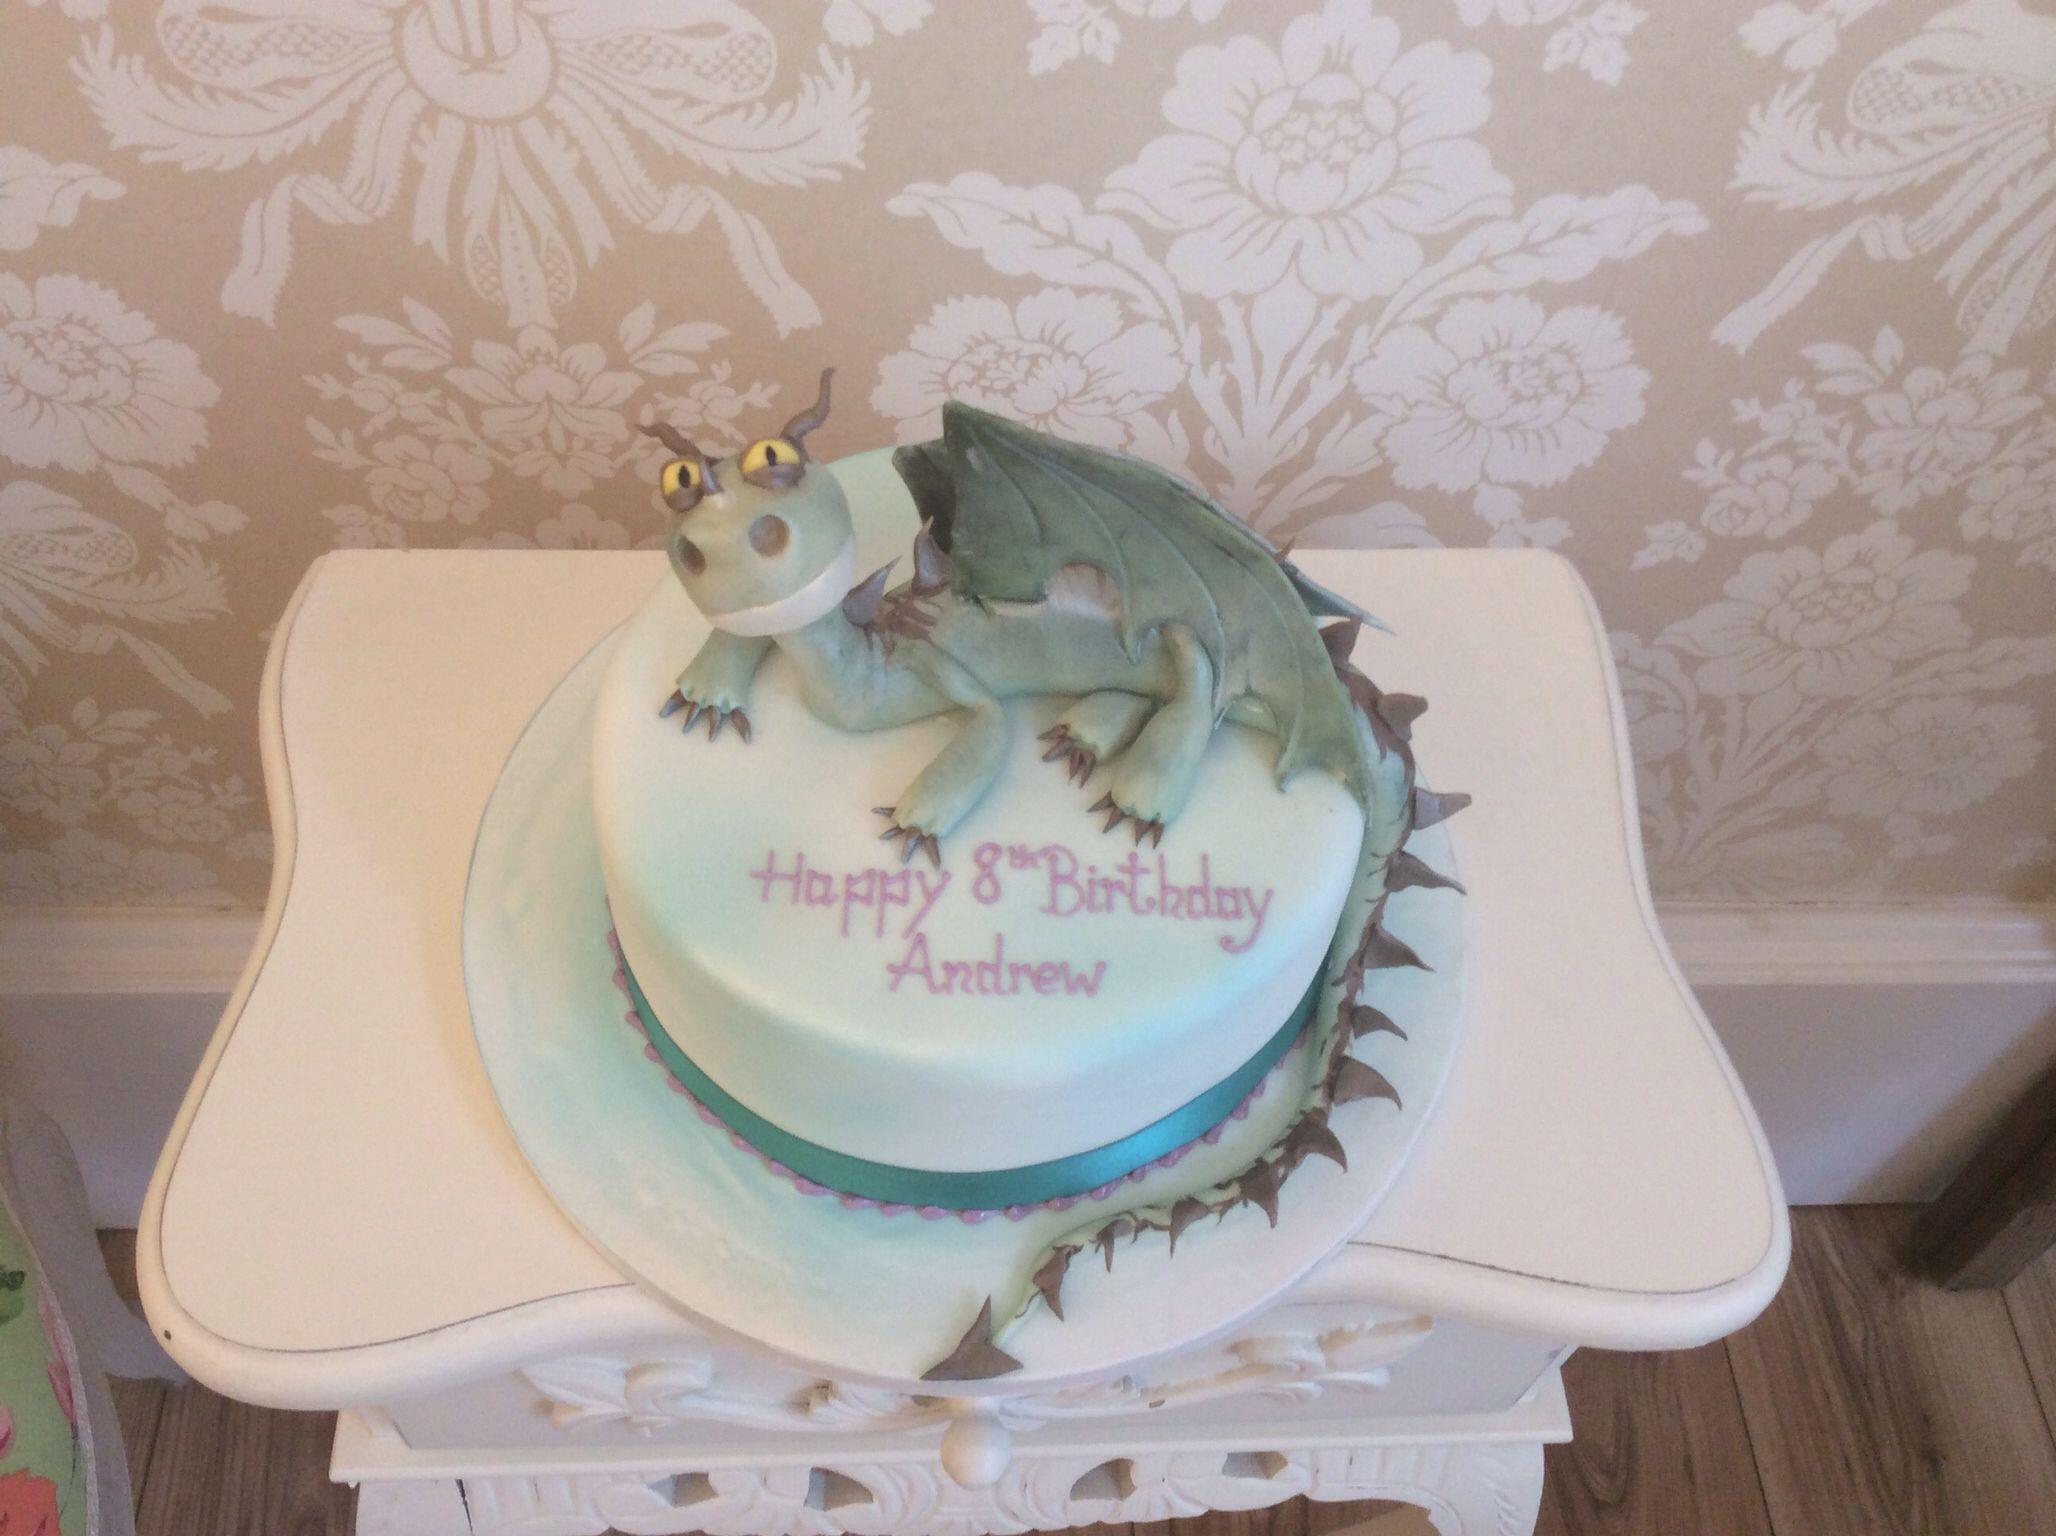 Terrible terror dragon novelty cake